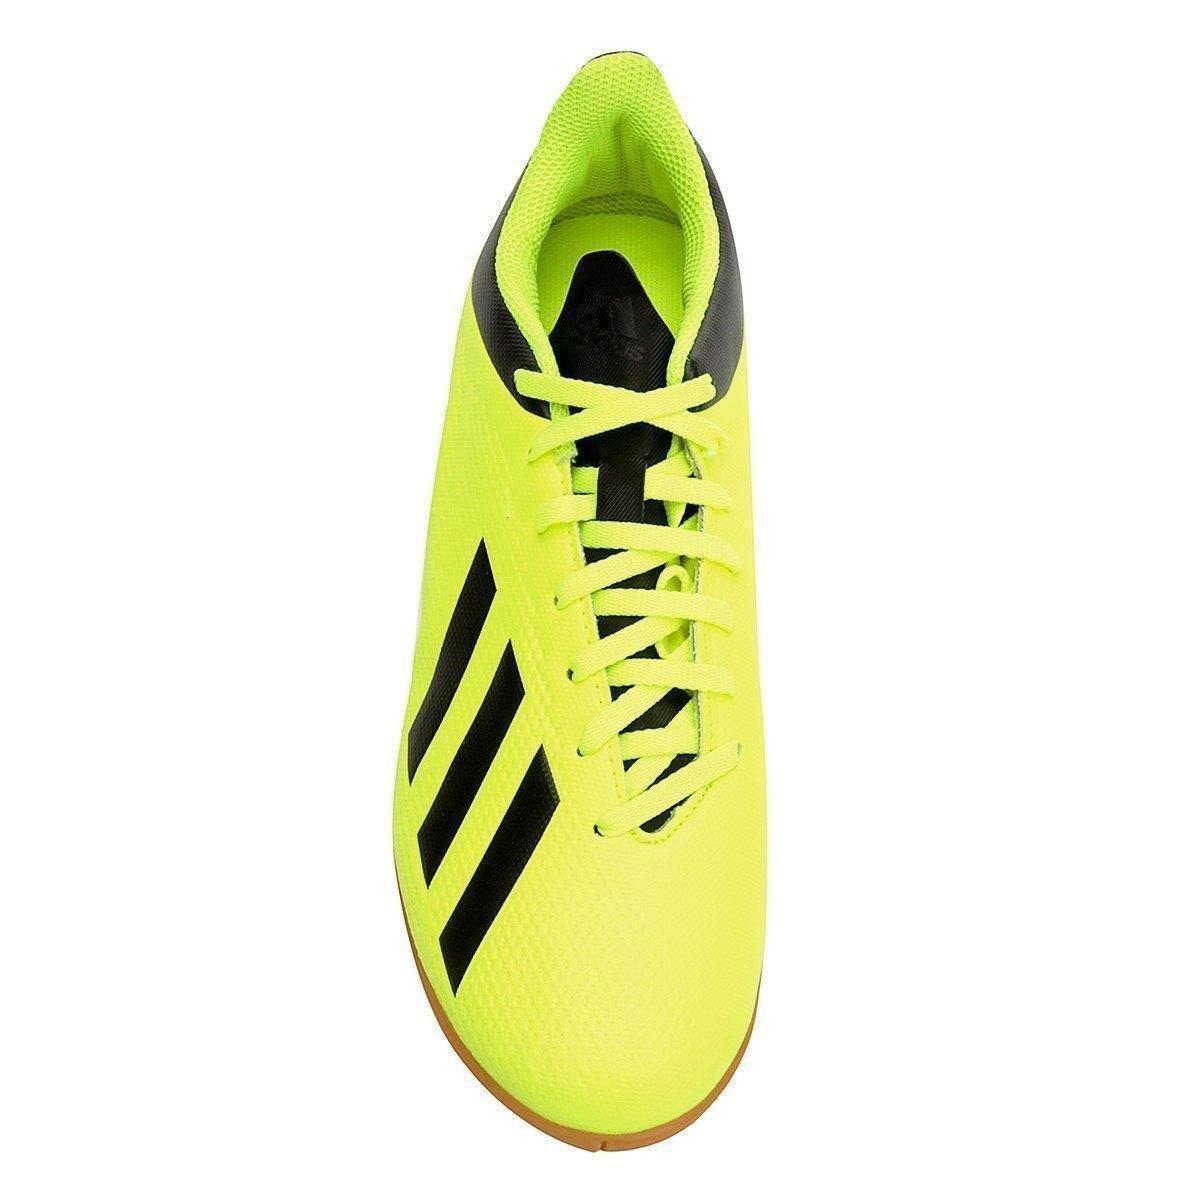 2b613a15f34 Chuteira Futsal Adidas X Tango 18 4 IN - Tam  44 - Shopping TudoAzul